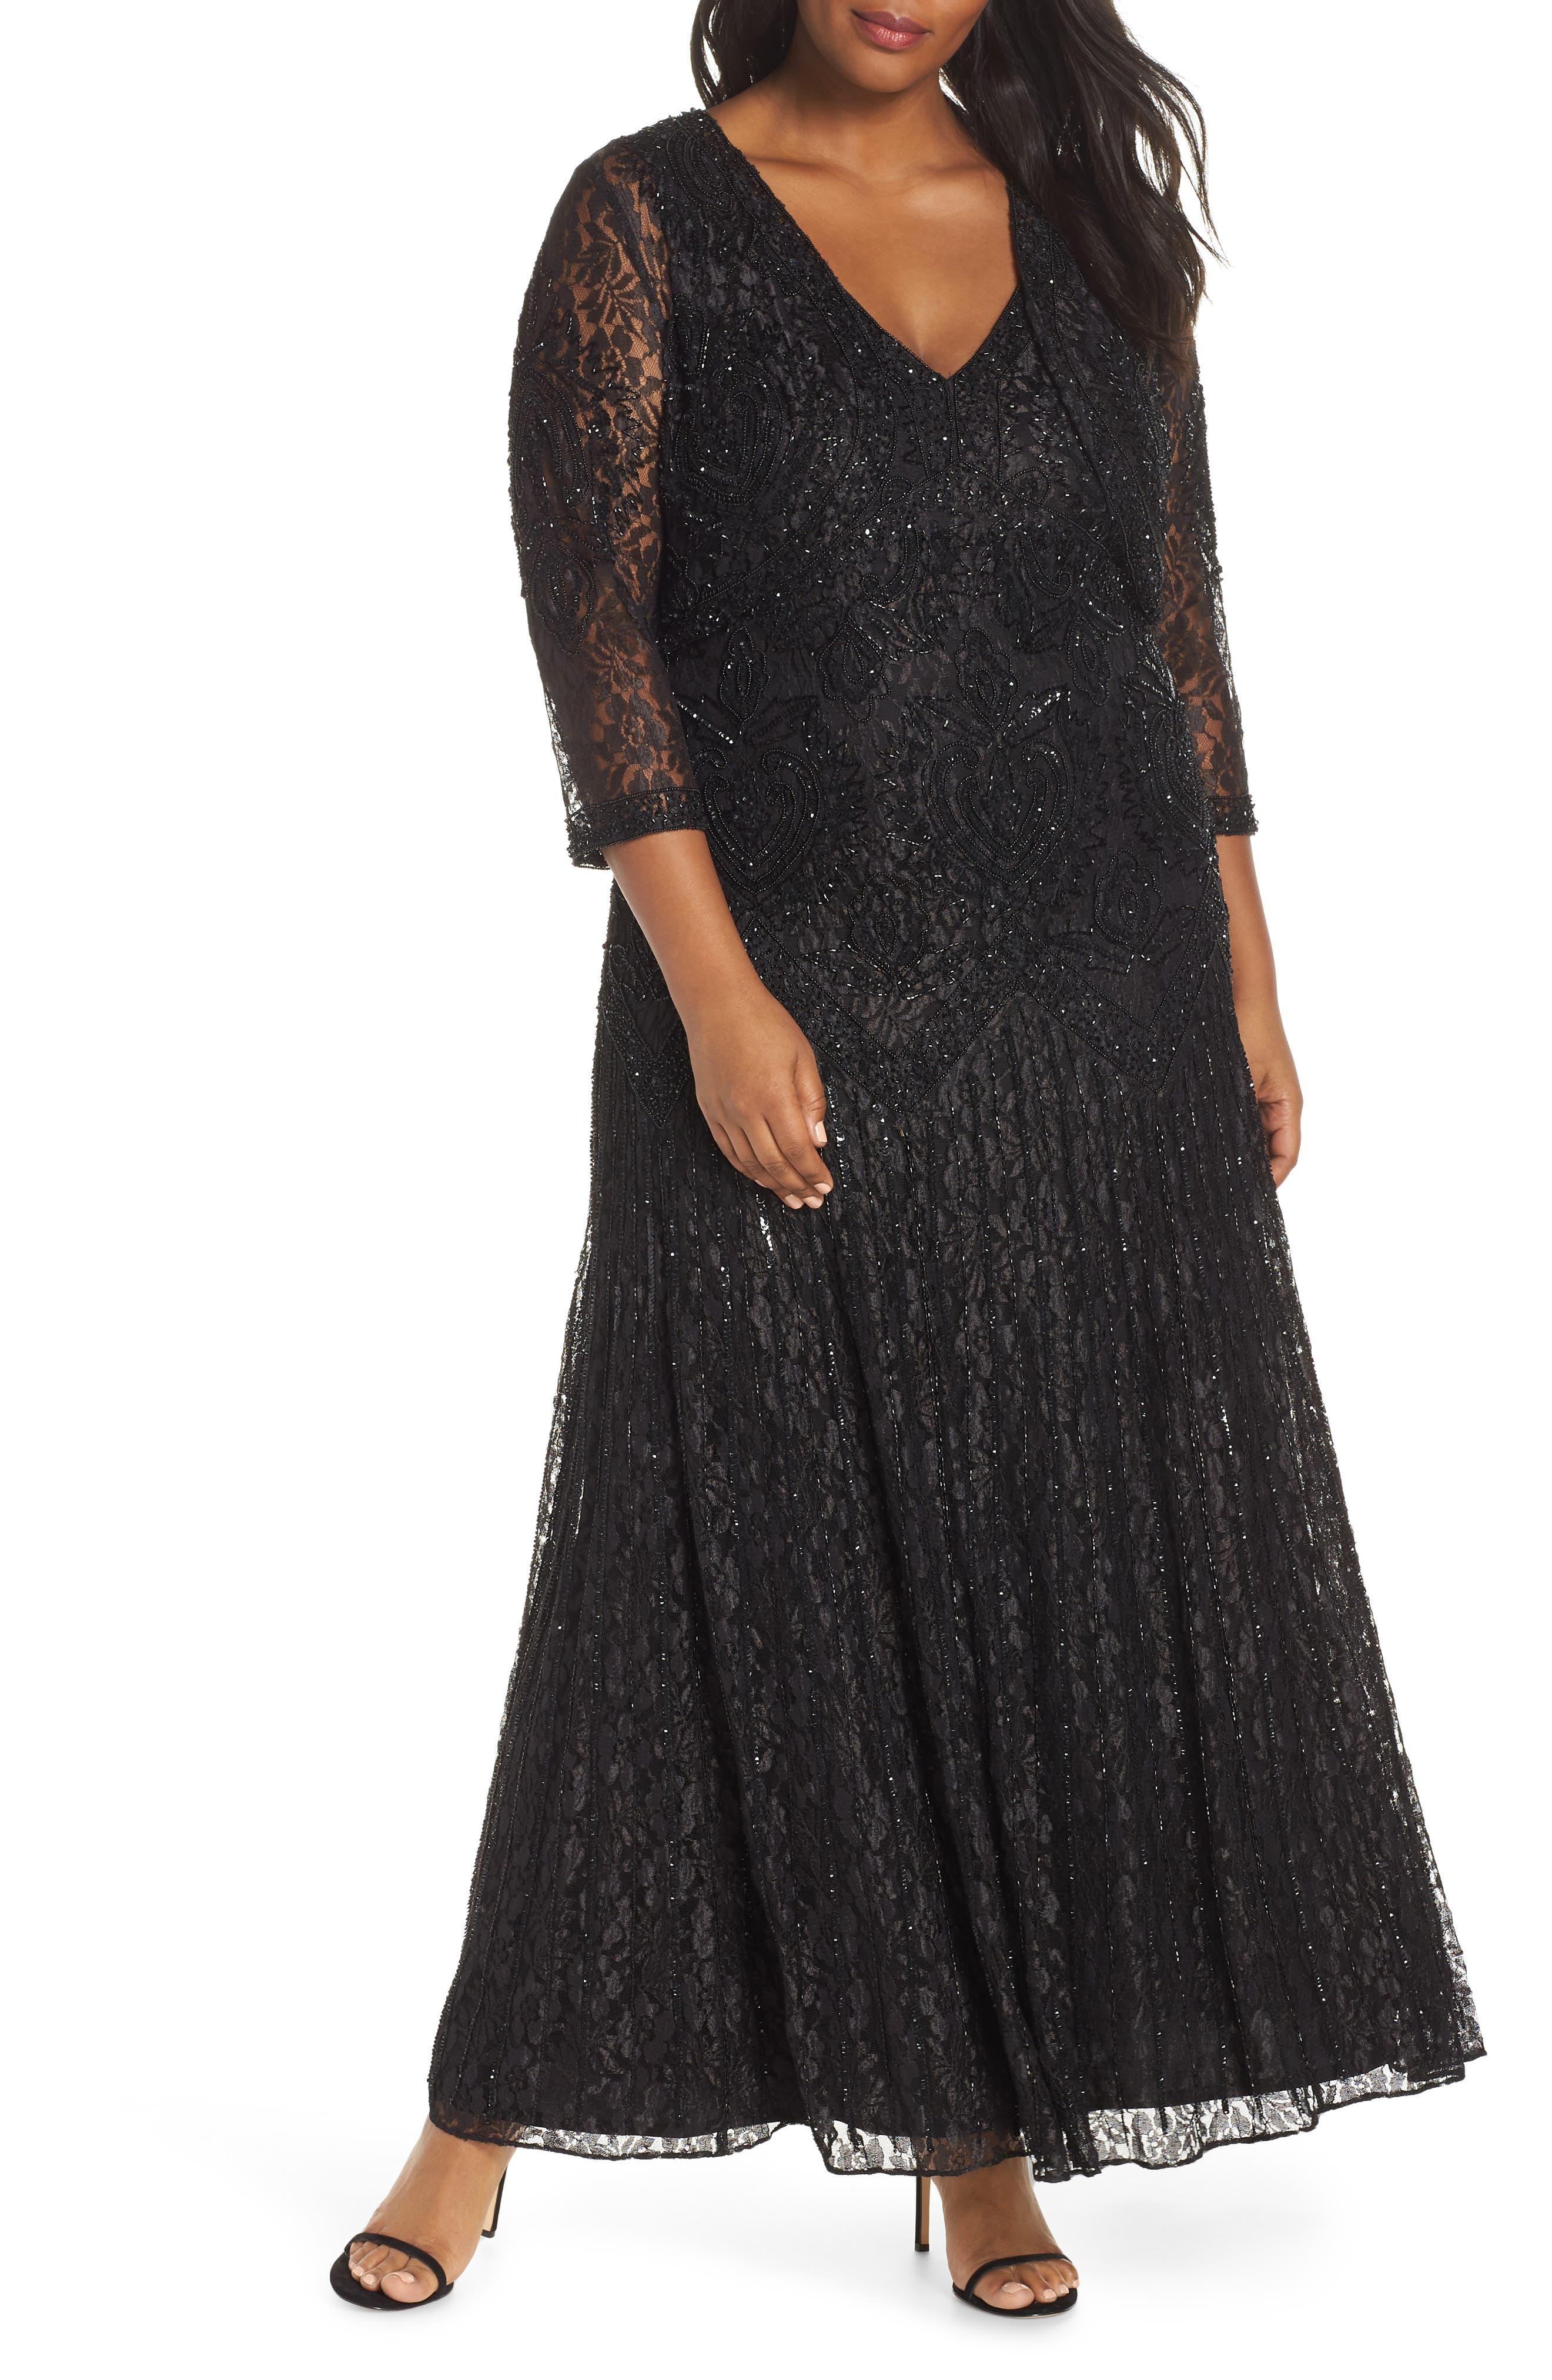 Plus Size Pisarro Nights Beaded Lace Evening Dress With Bolero, Black